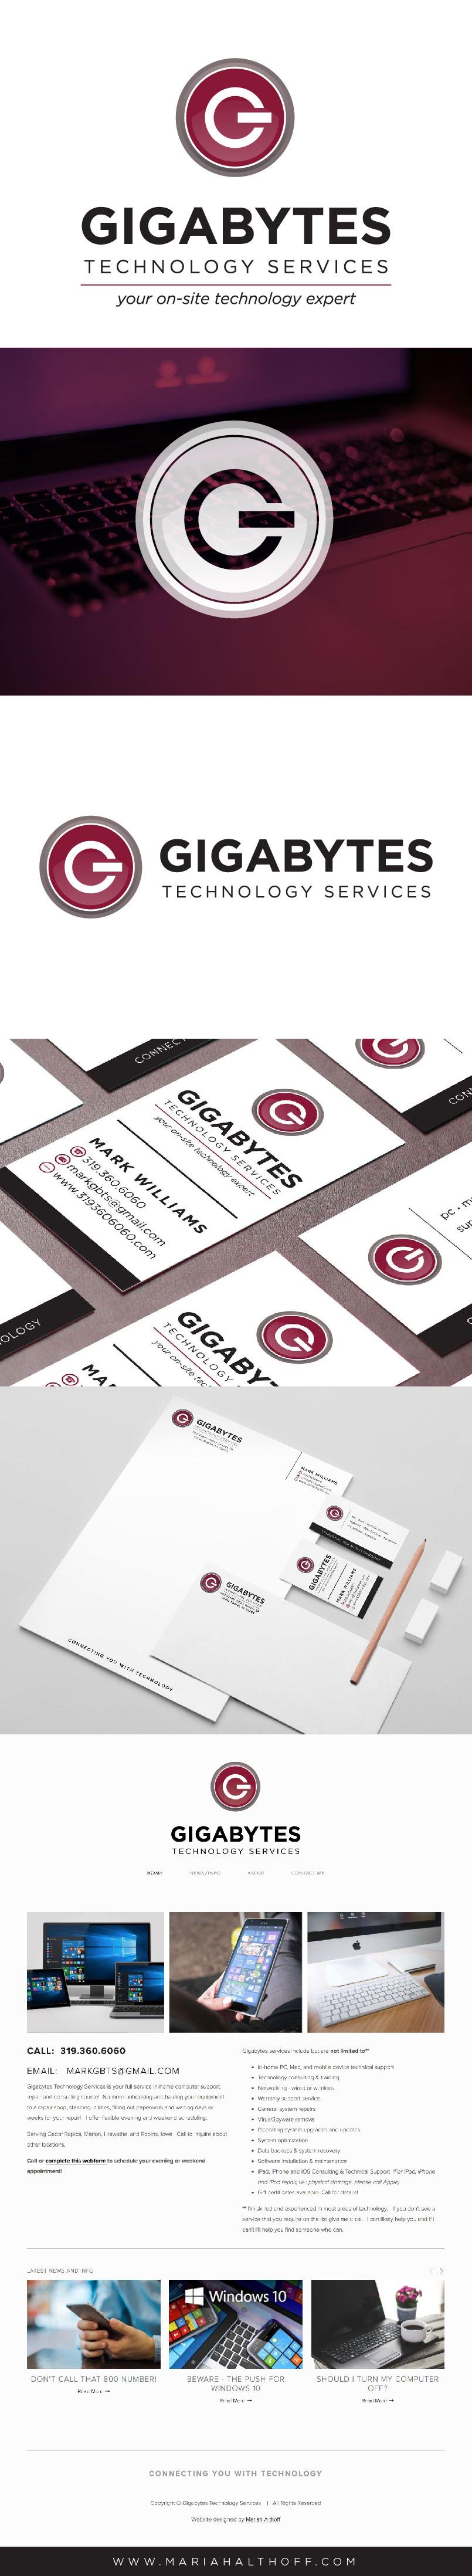 Technology logo design, tech brand design, computer graphic design, sleek, modern, minimalist, brand design, Gigabytes Technology Solutions branding.